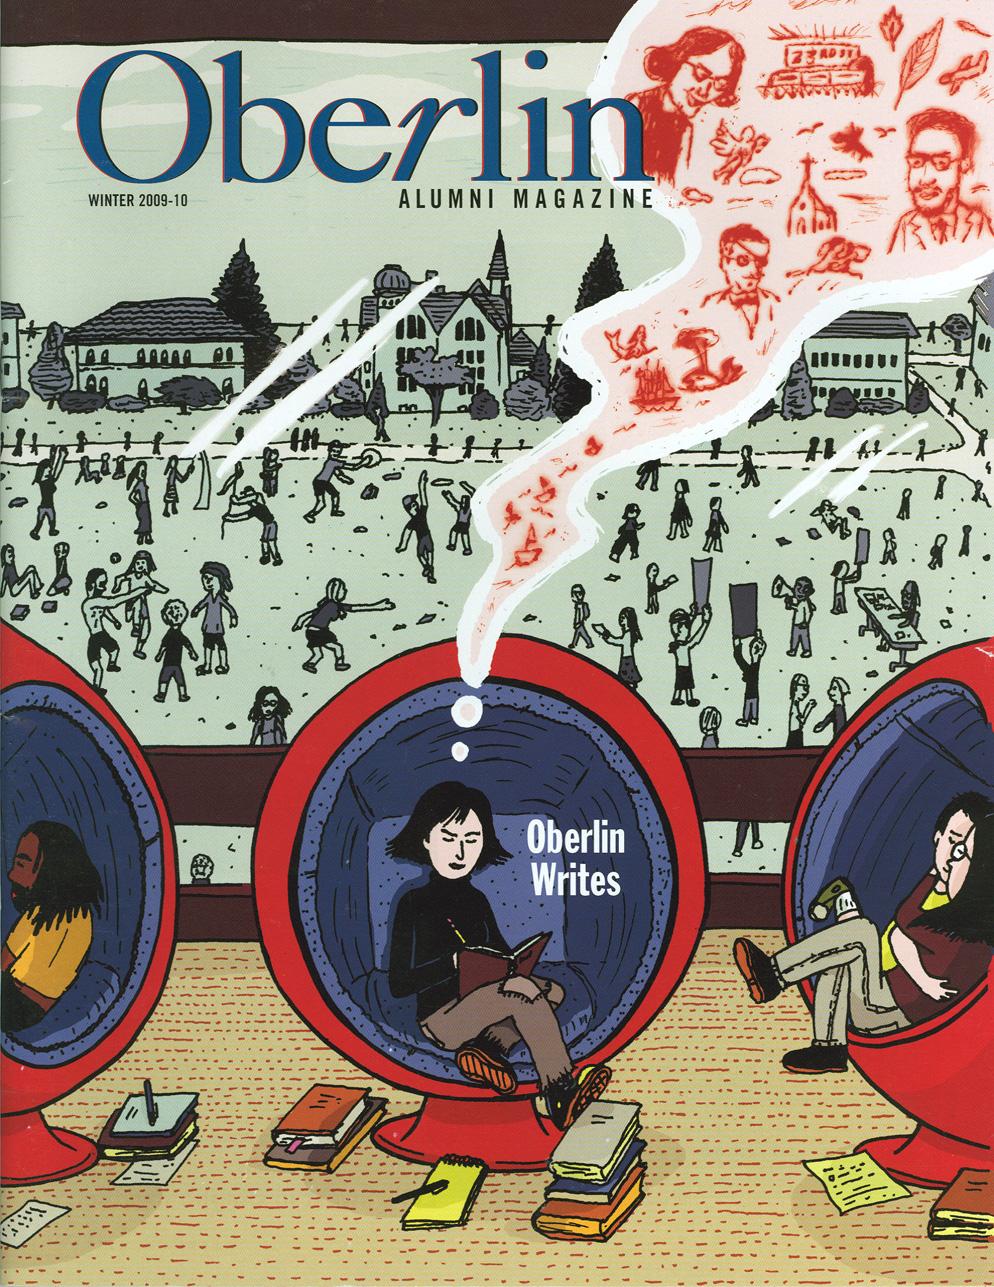 Oberlin Alumni Cover